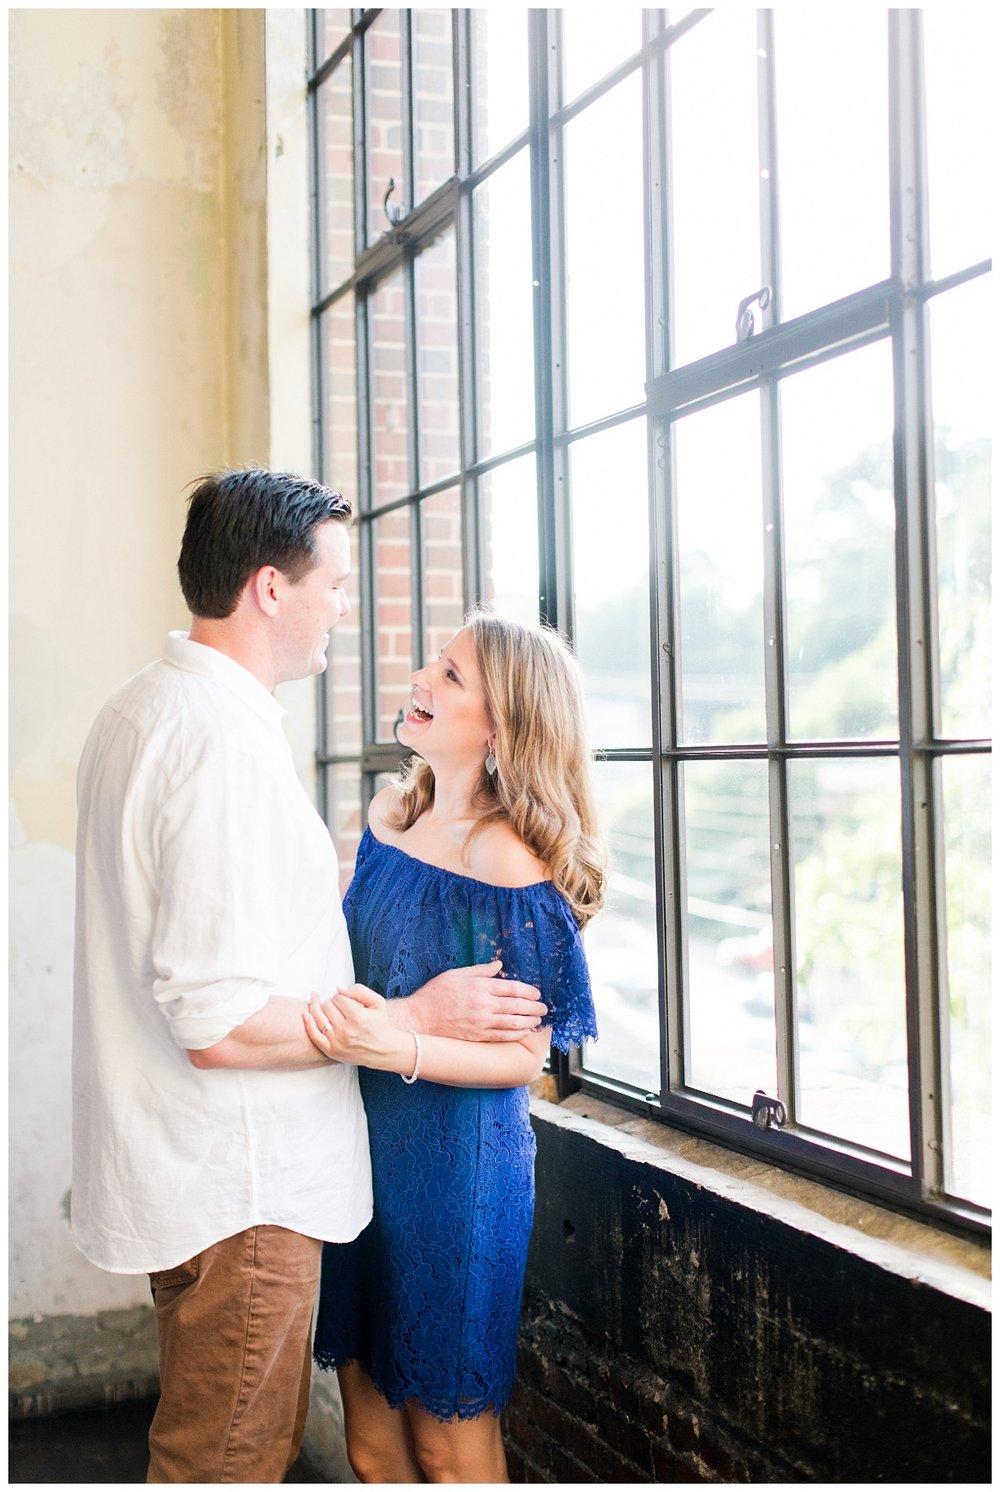 Engagement Pictures_KIm and Hamish_Abby Breaux Photography_Atlanta_Ponce City Market_Jackson Street Bridge_0017.jpg